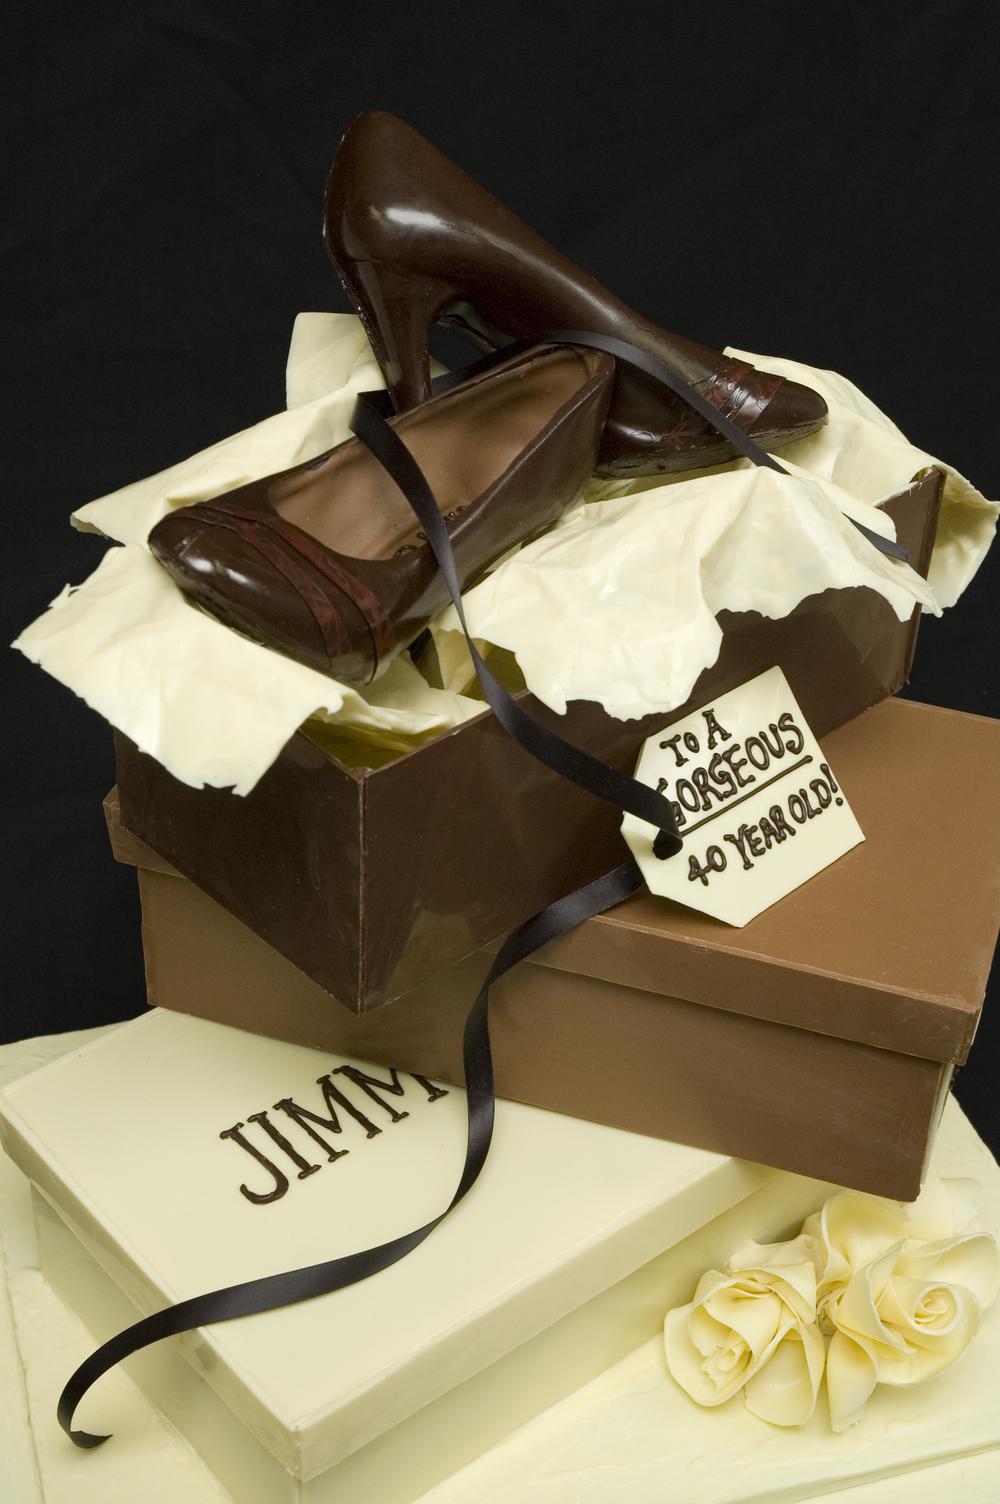 shebakes_chocolate_jimmy choo_01.jpg